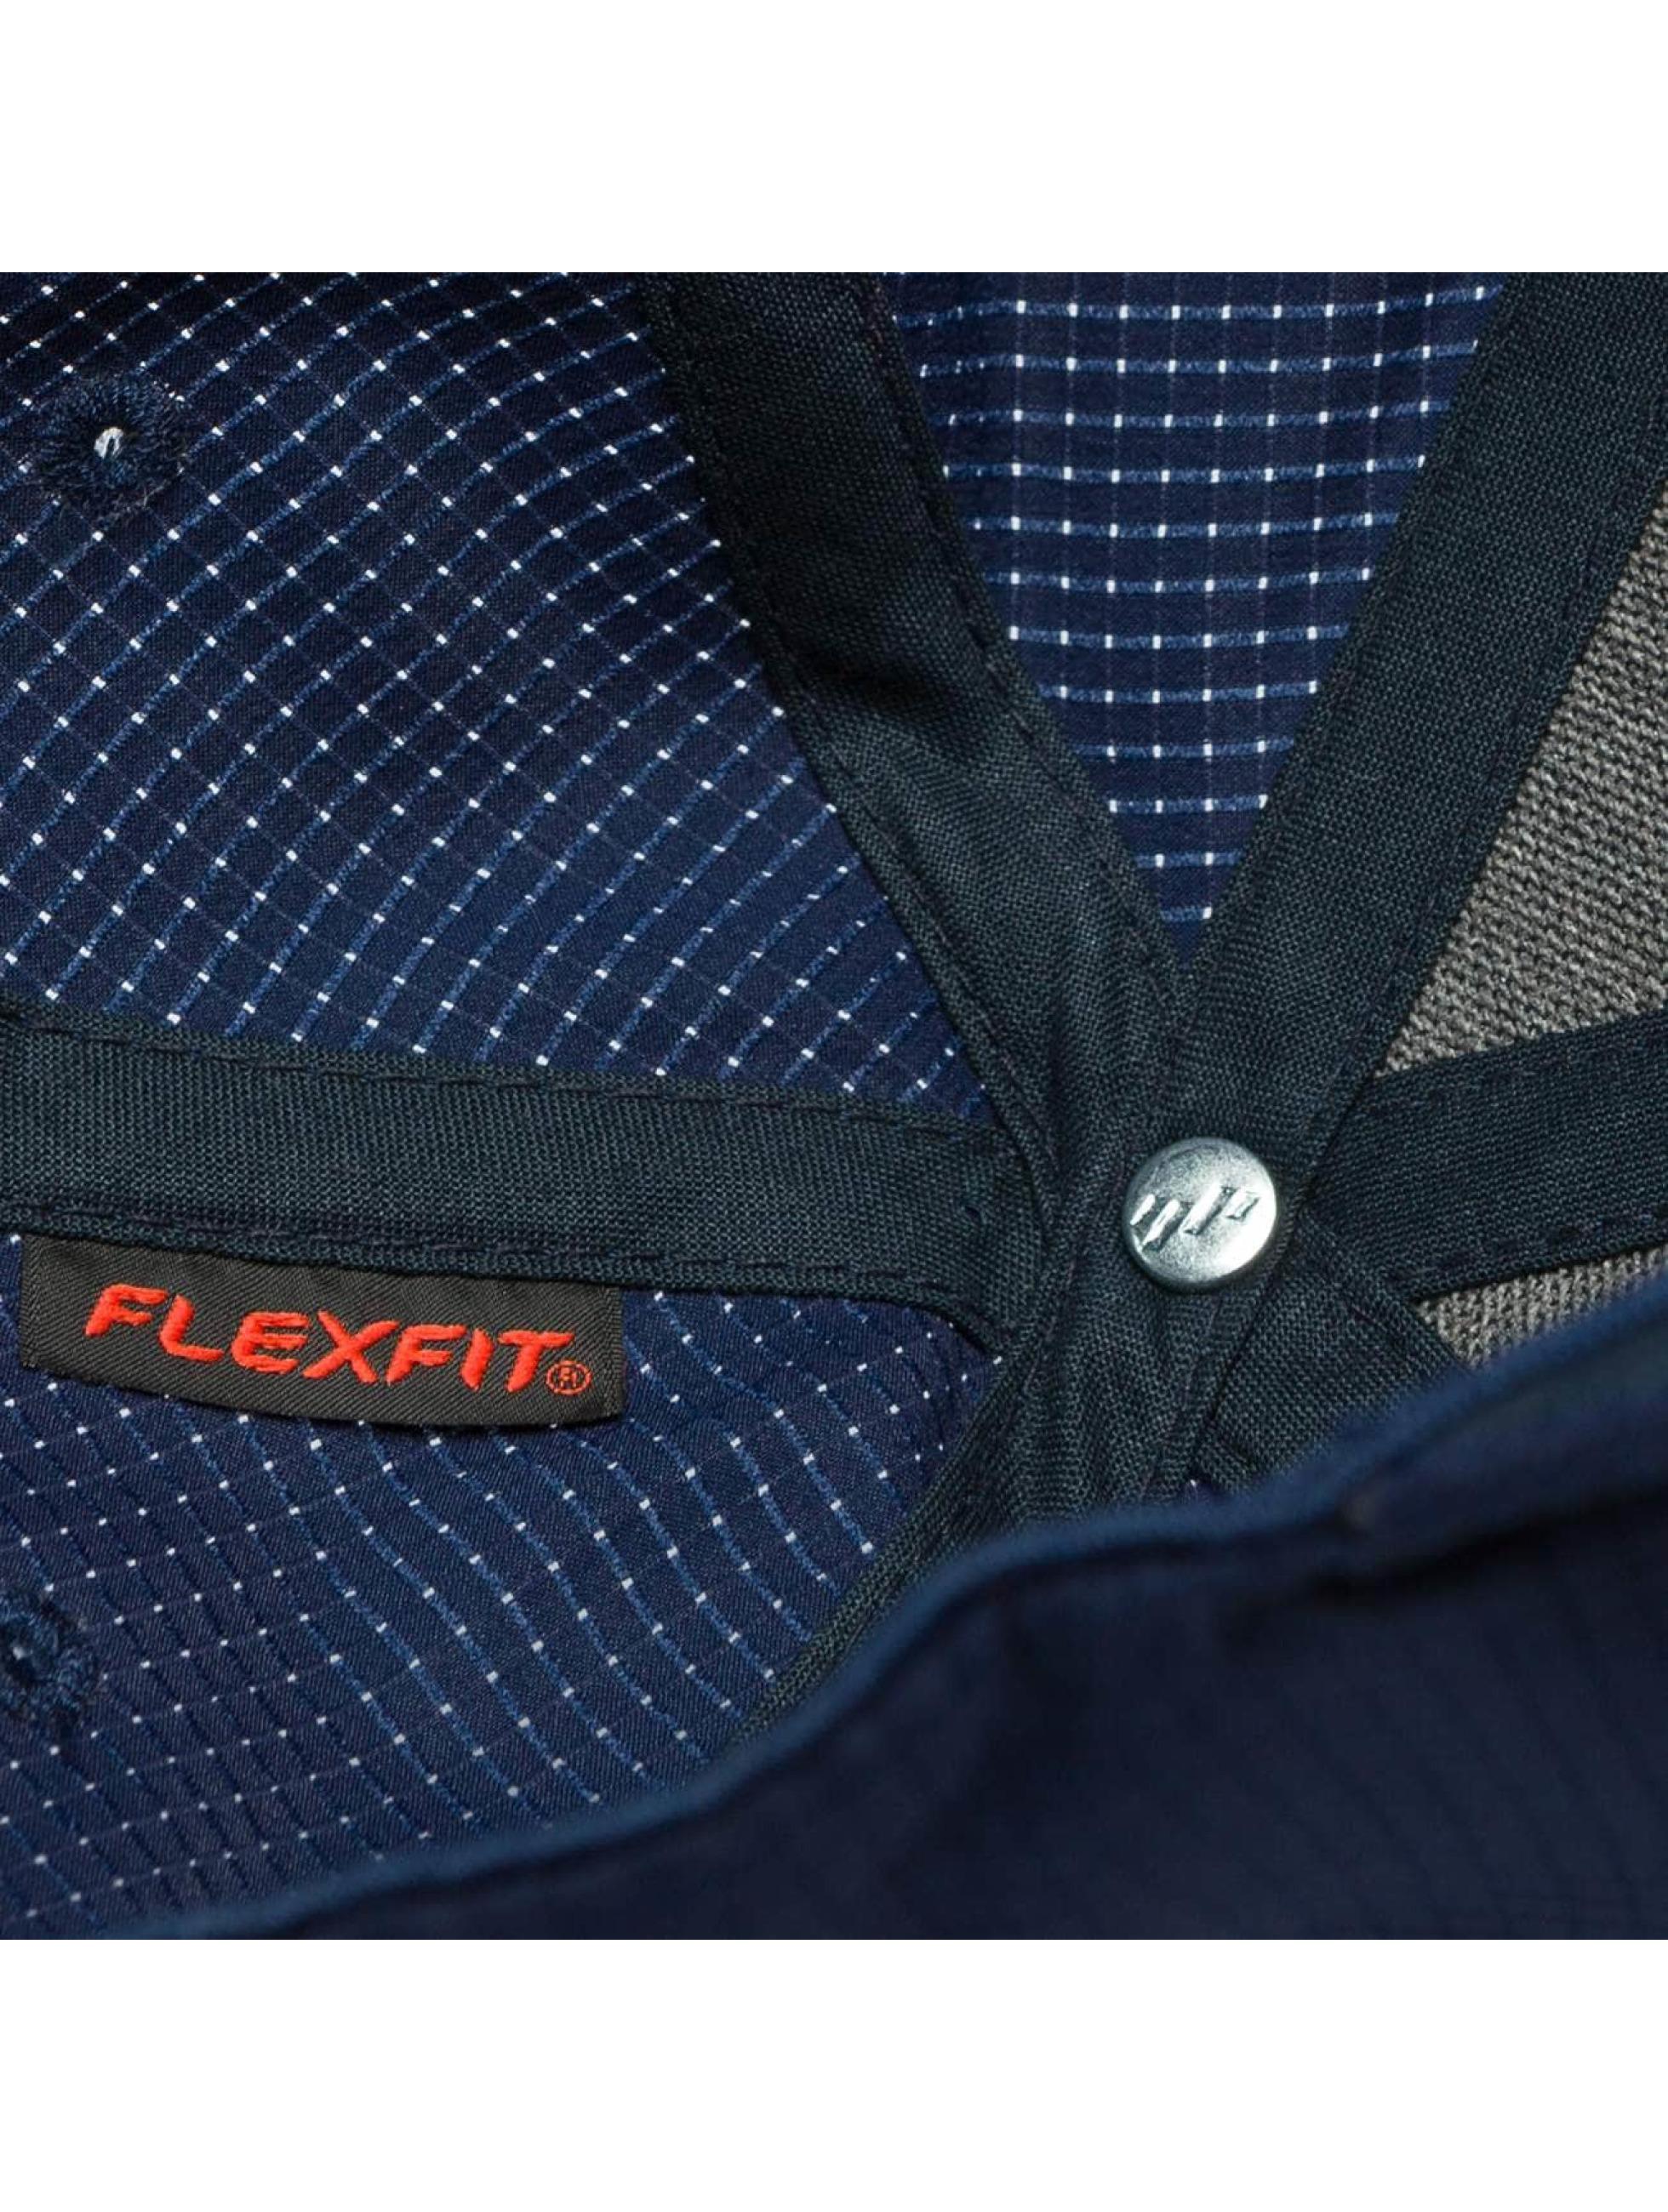 Flexfit Бейсболкa Flexfit Hydro-Grid синий